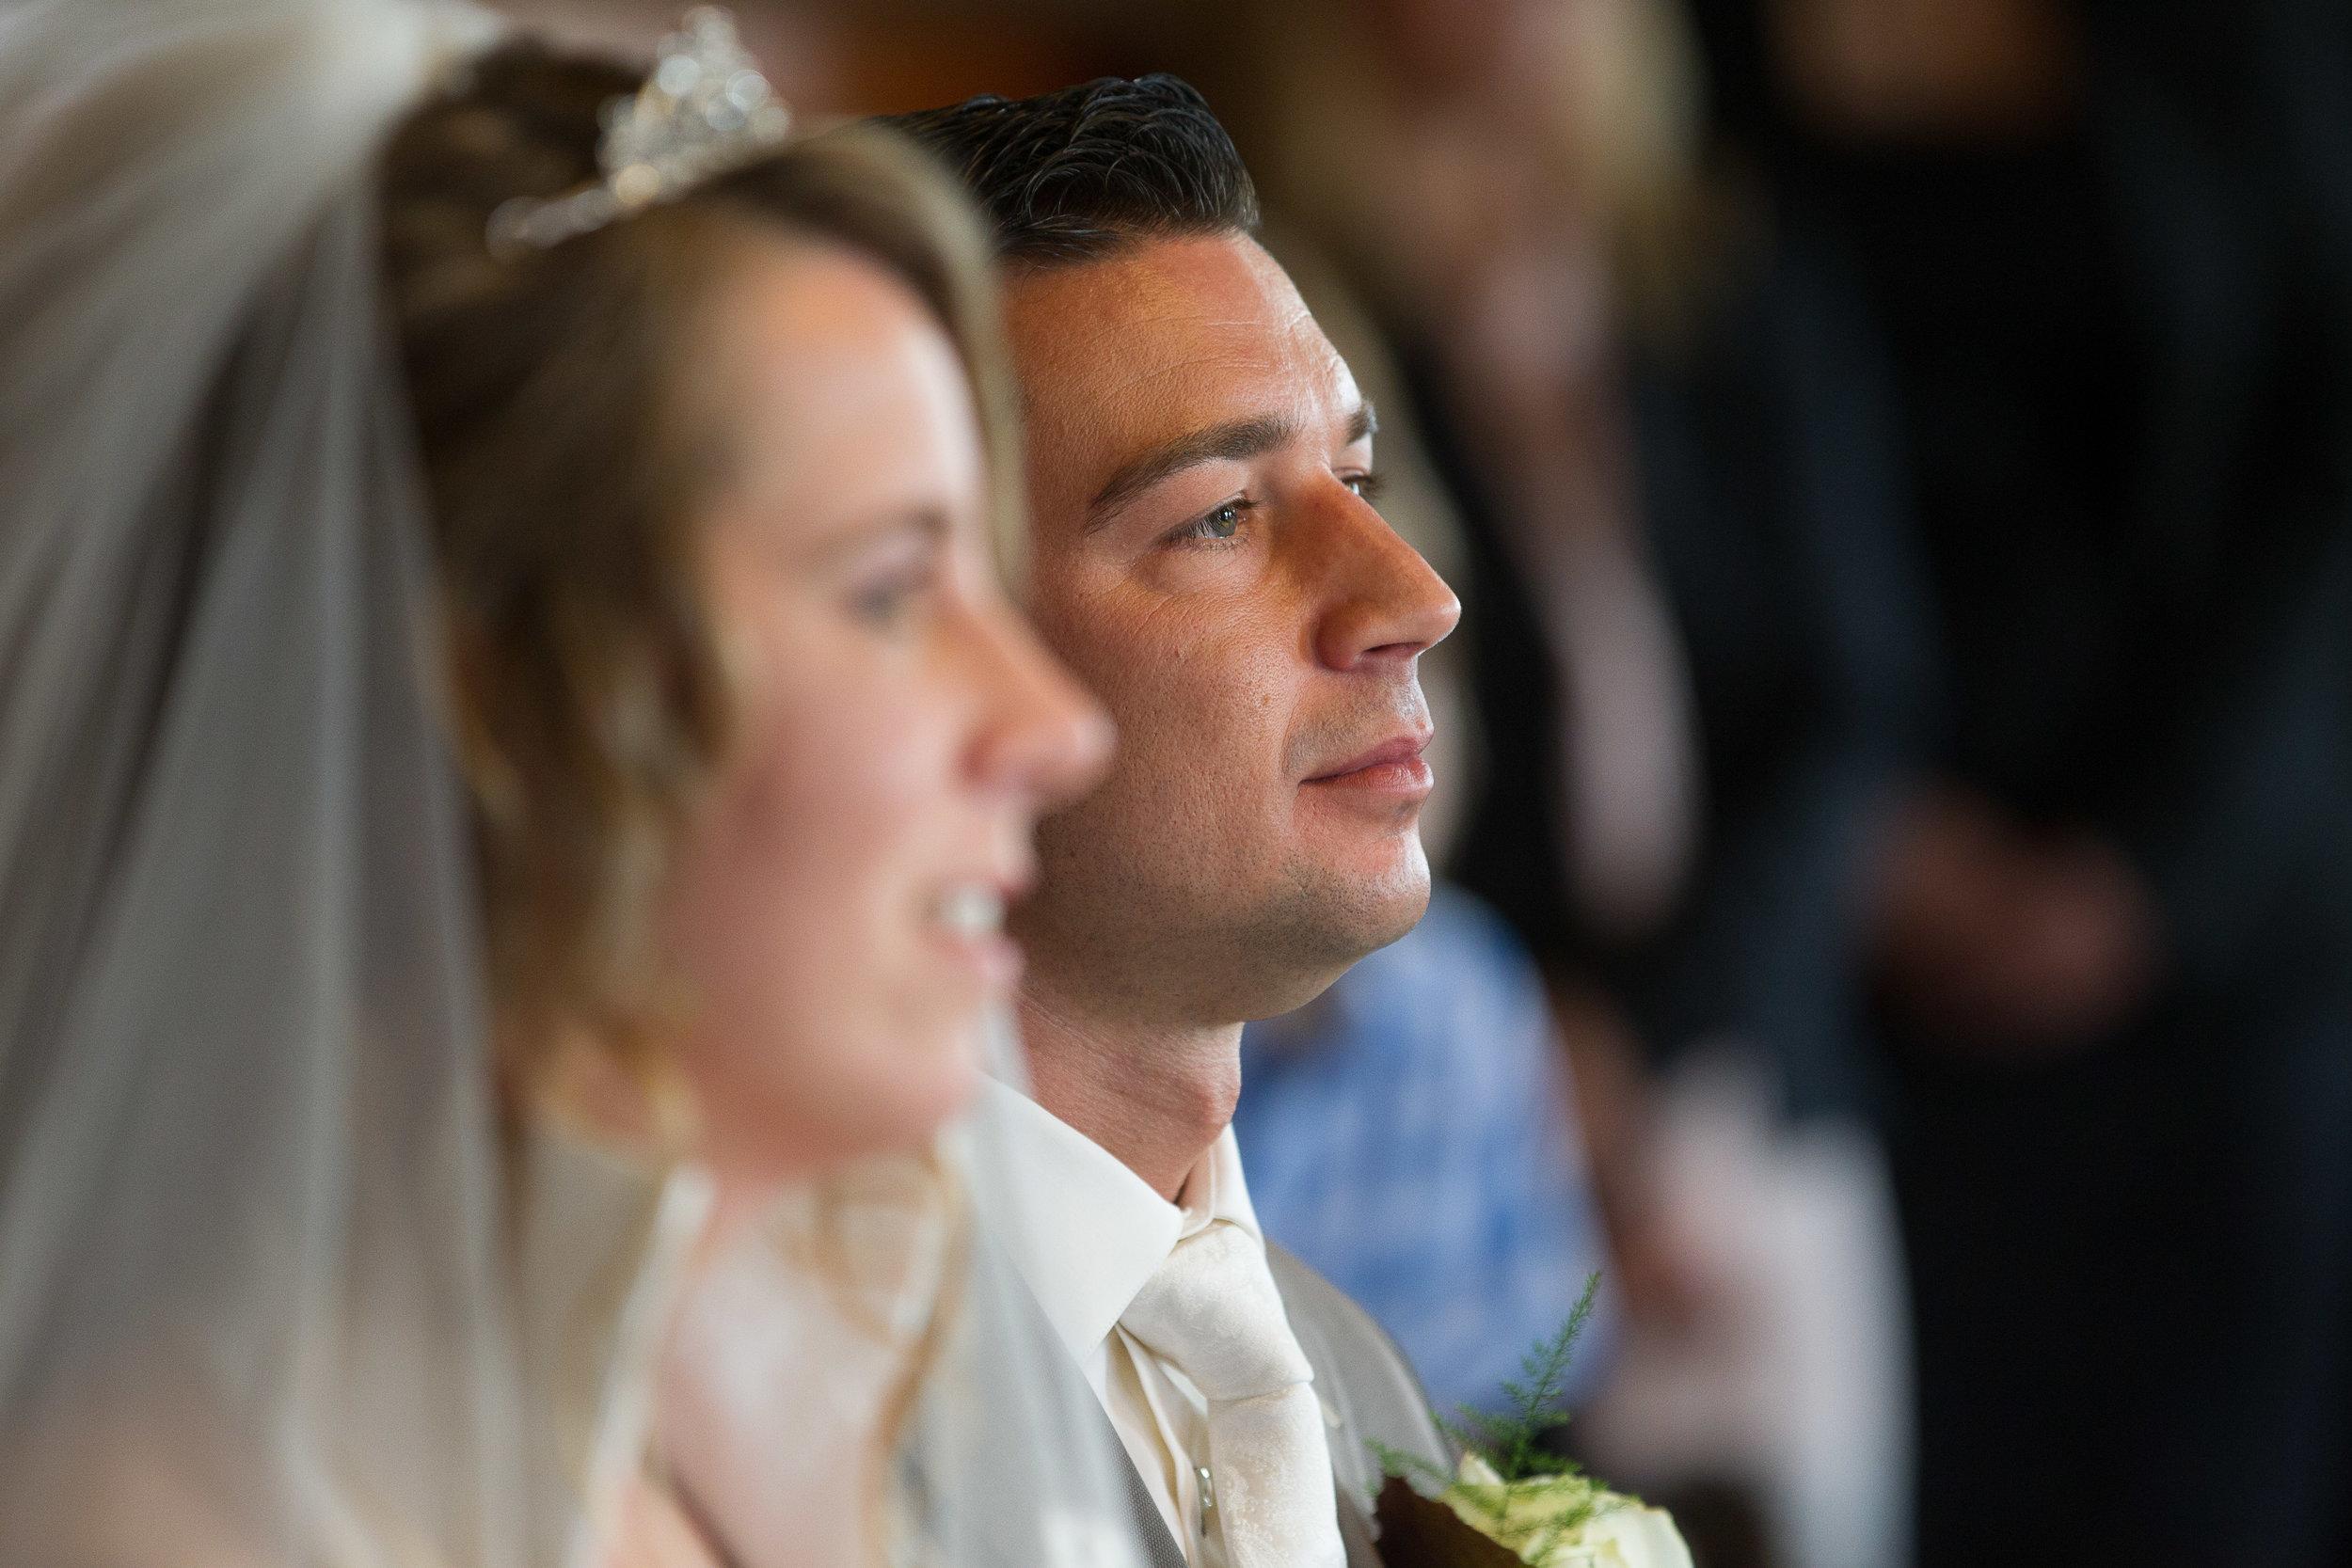 bruidsfotografie-trouwreportage-huwelijksfotografie-bruidsfotograaf-feestfotografie-Anouk en Edgar-64.jpg